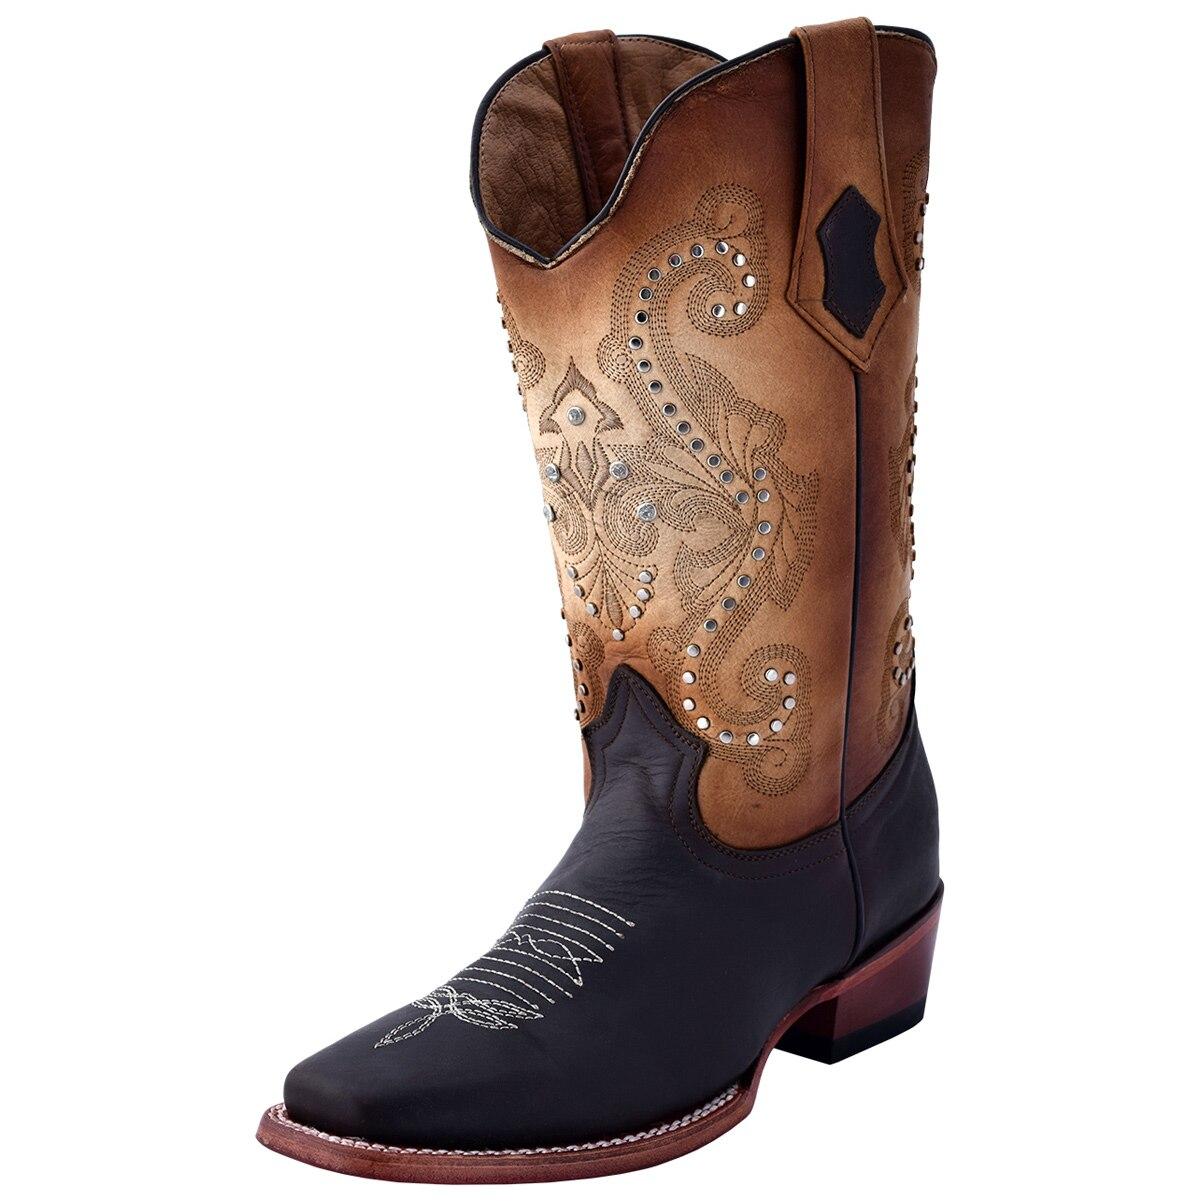 Ferrini Women's Studded Cowgirl Square Toe Boots